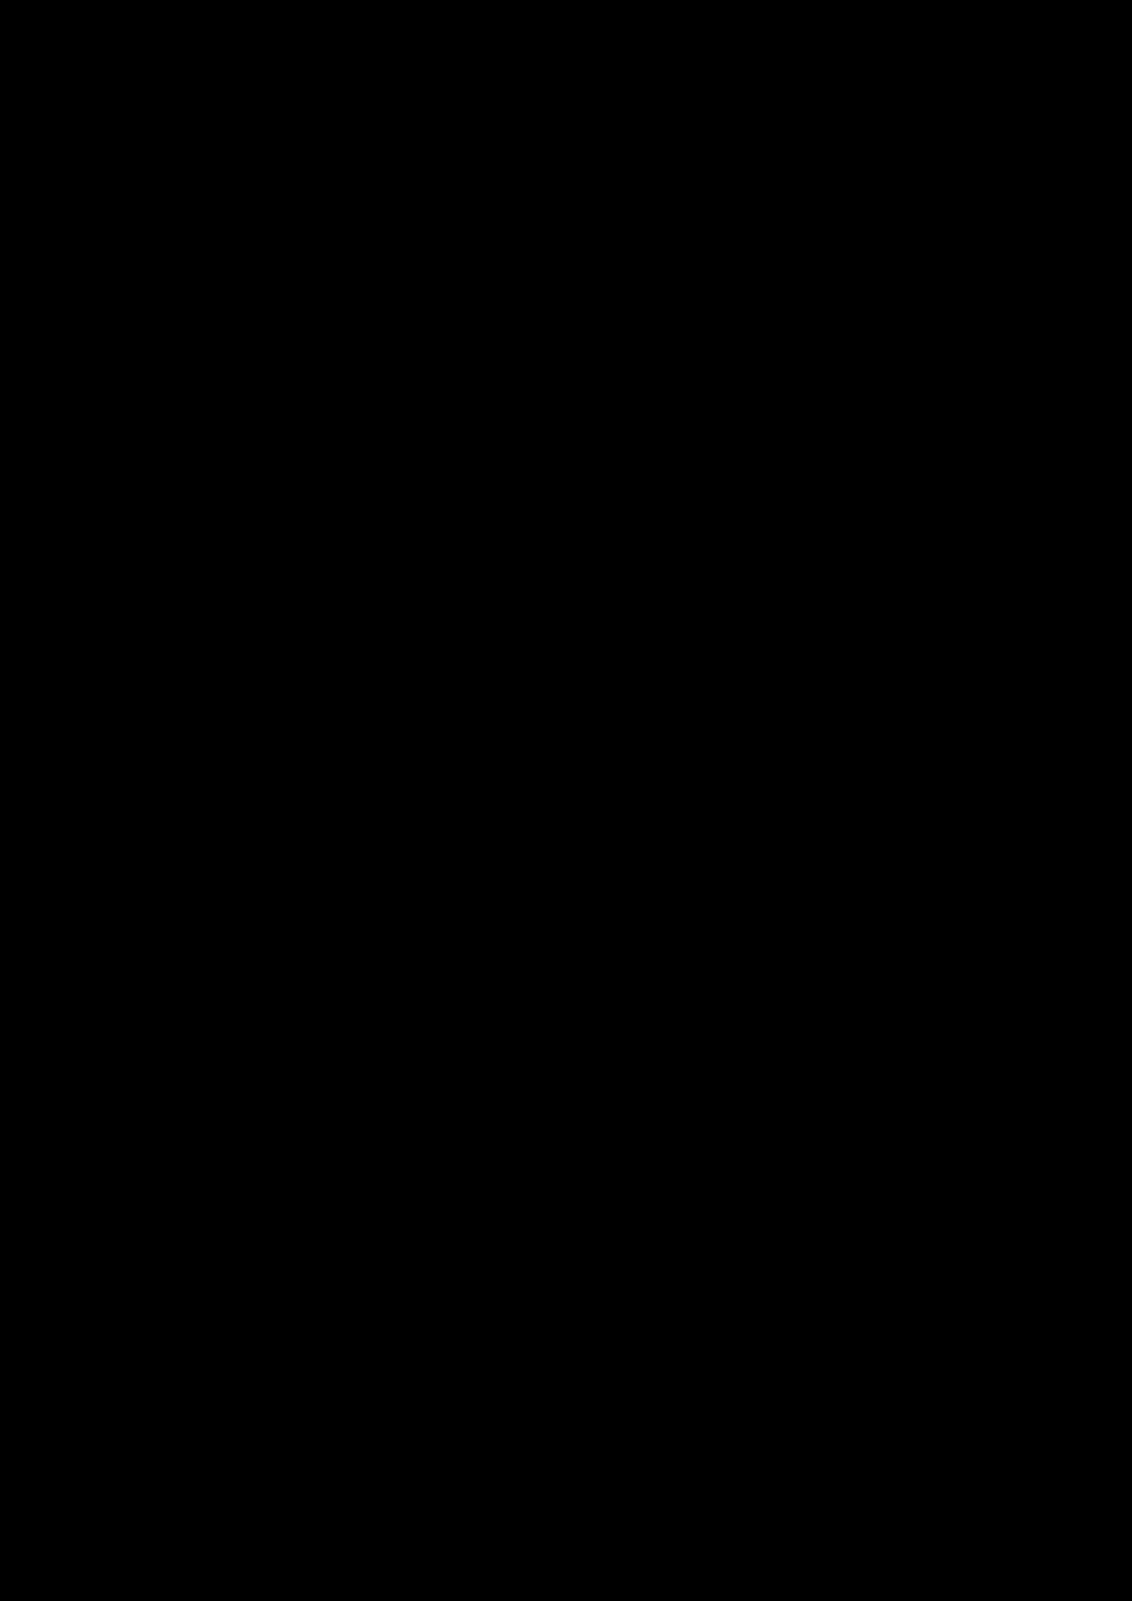 Belyiy sokol slide, Image 74